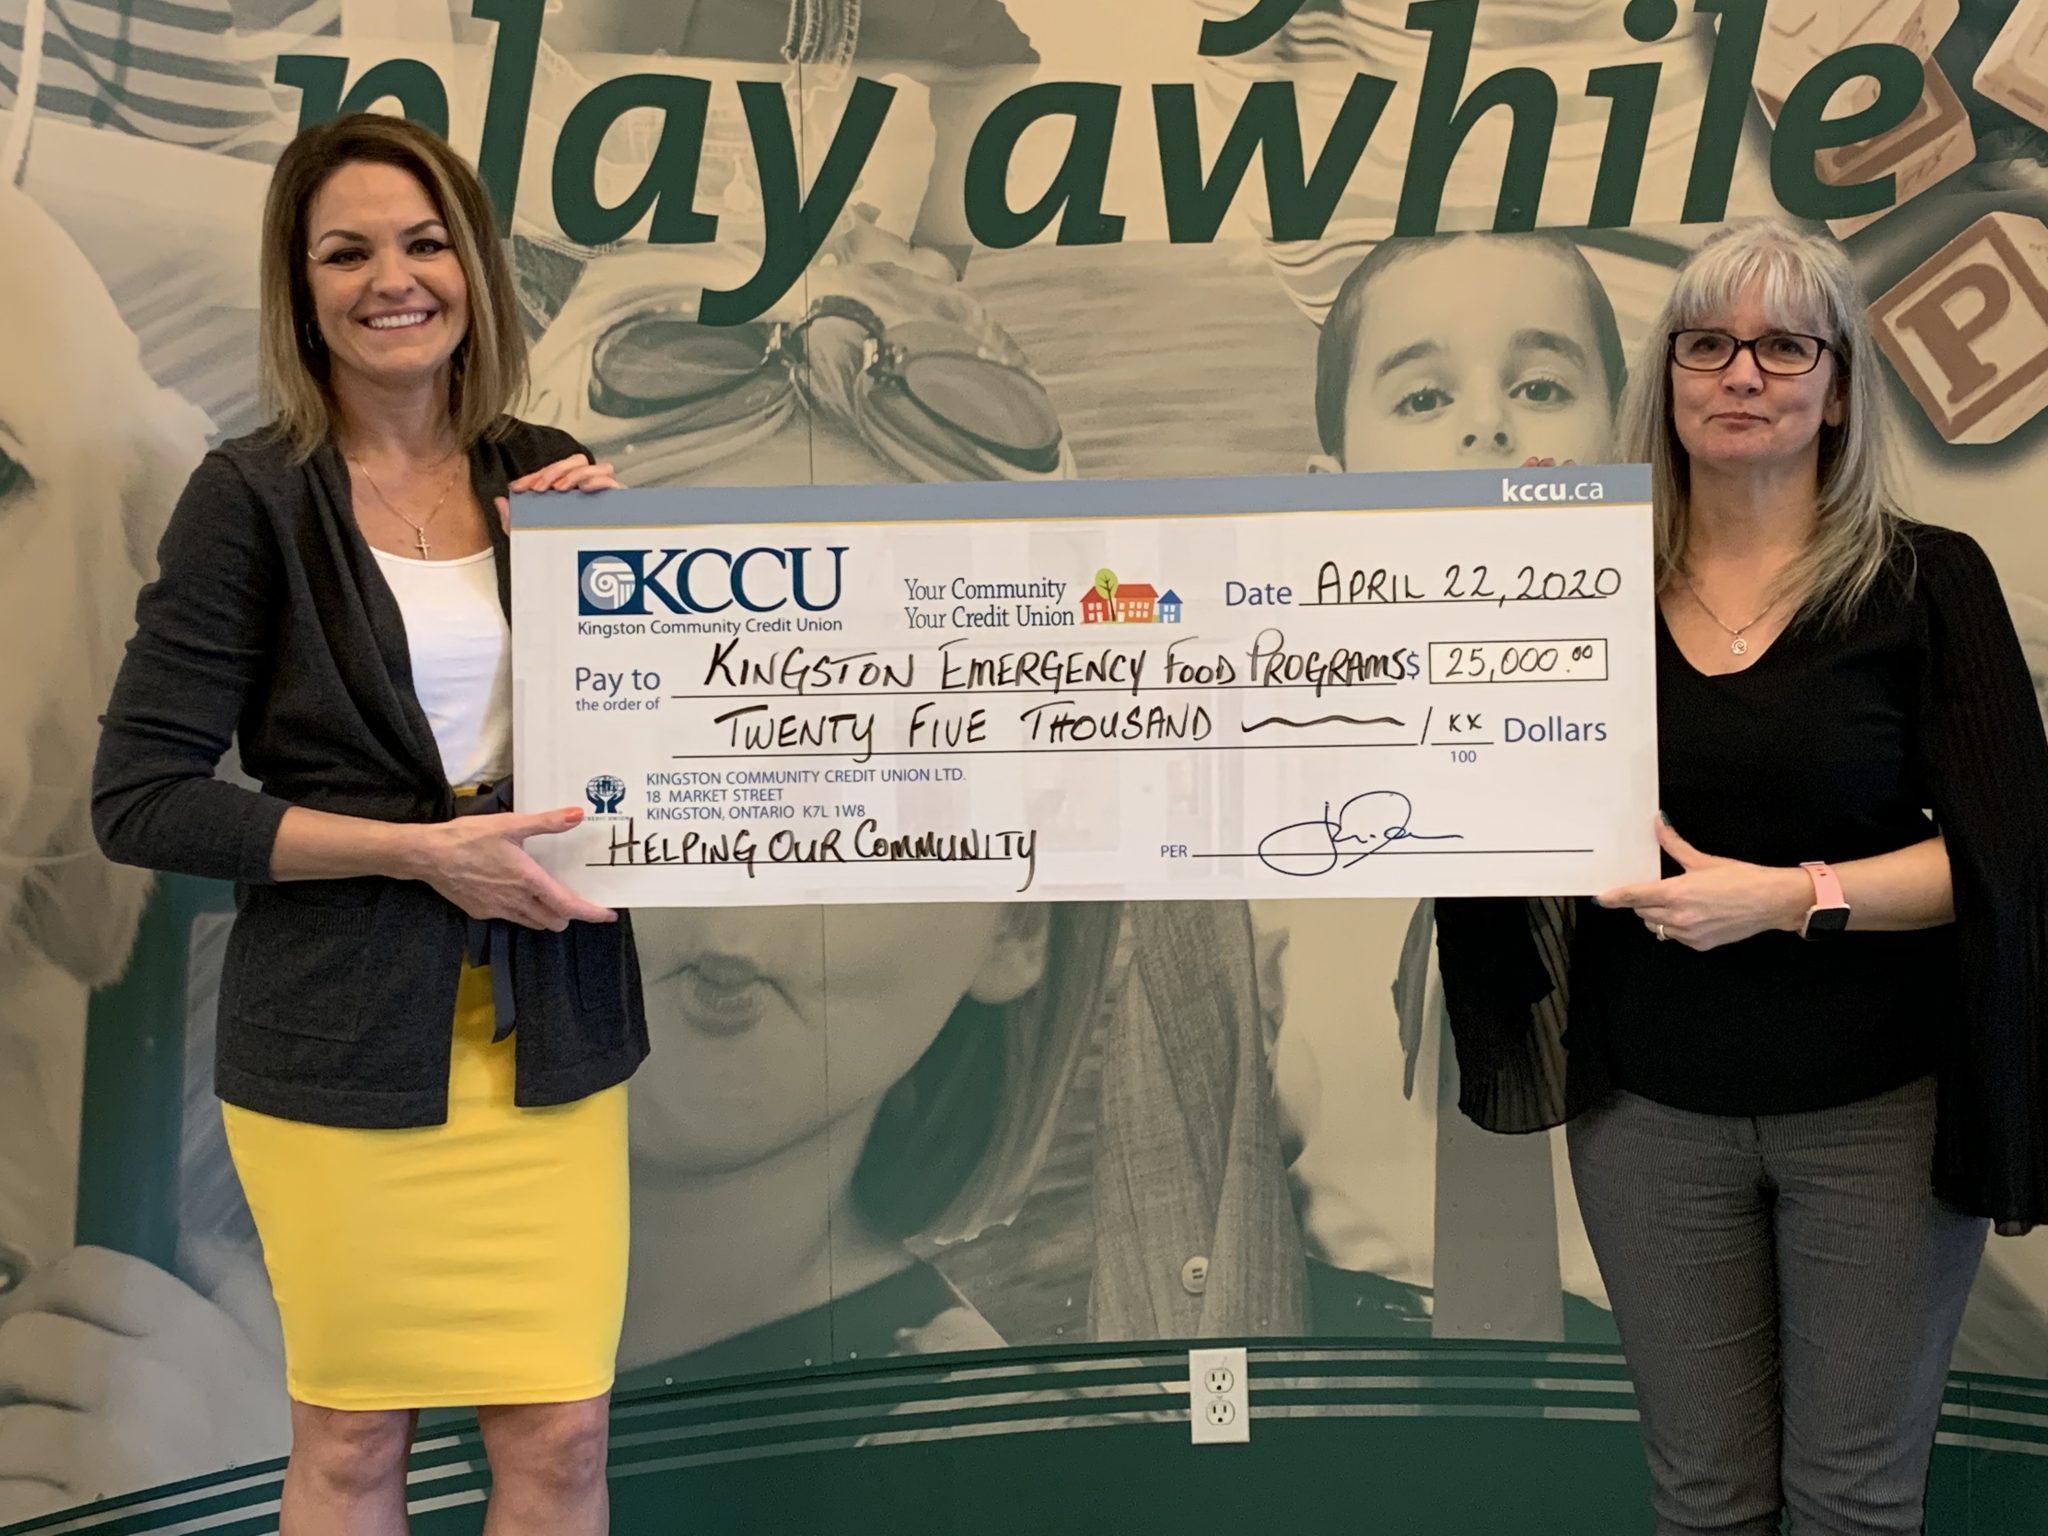 KCCU donates $25k to help local emergency food programs